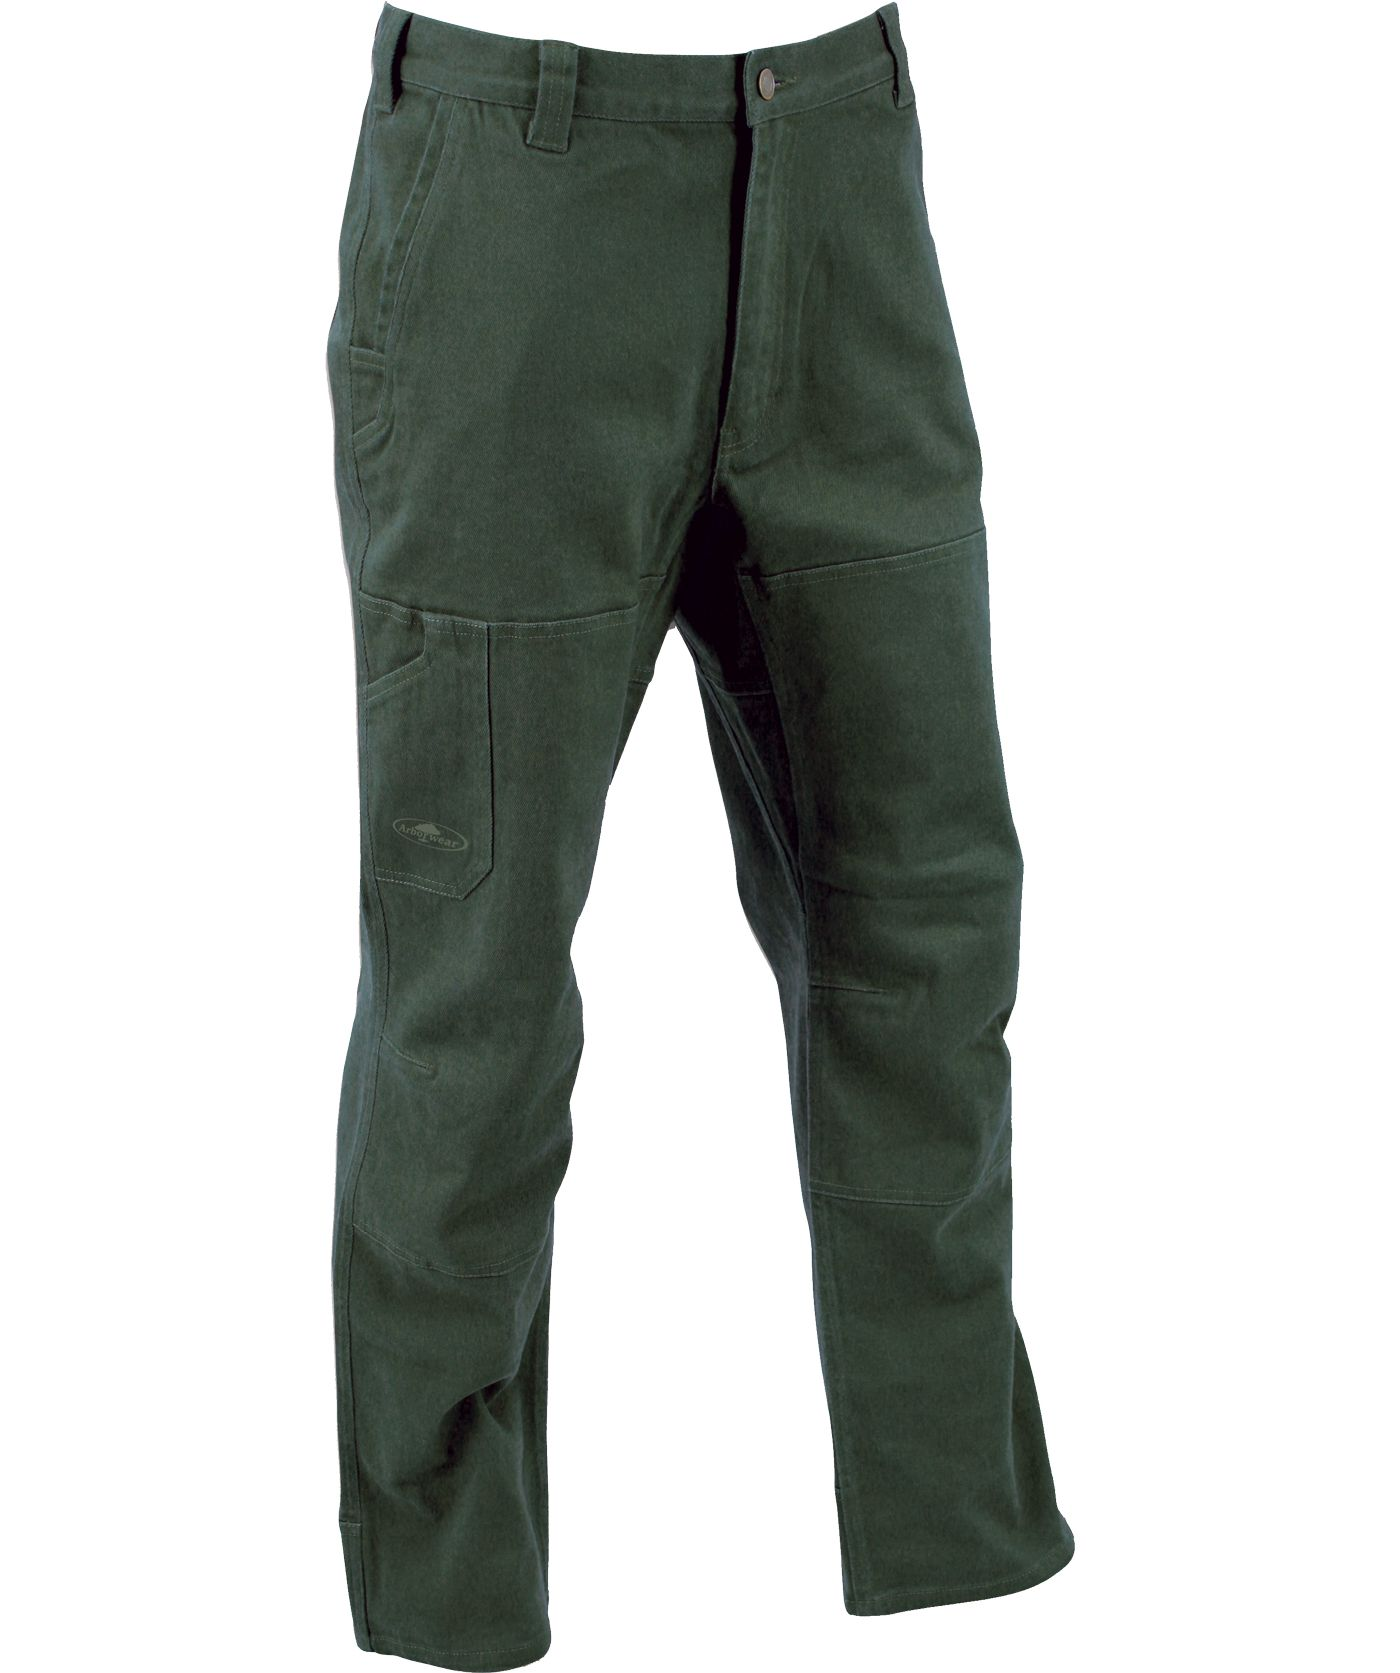 Arborwear Men's Cedar Flex Pants